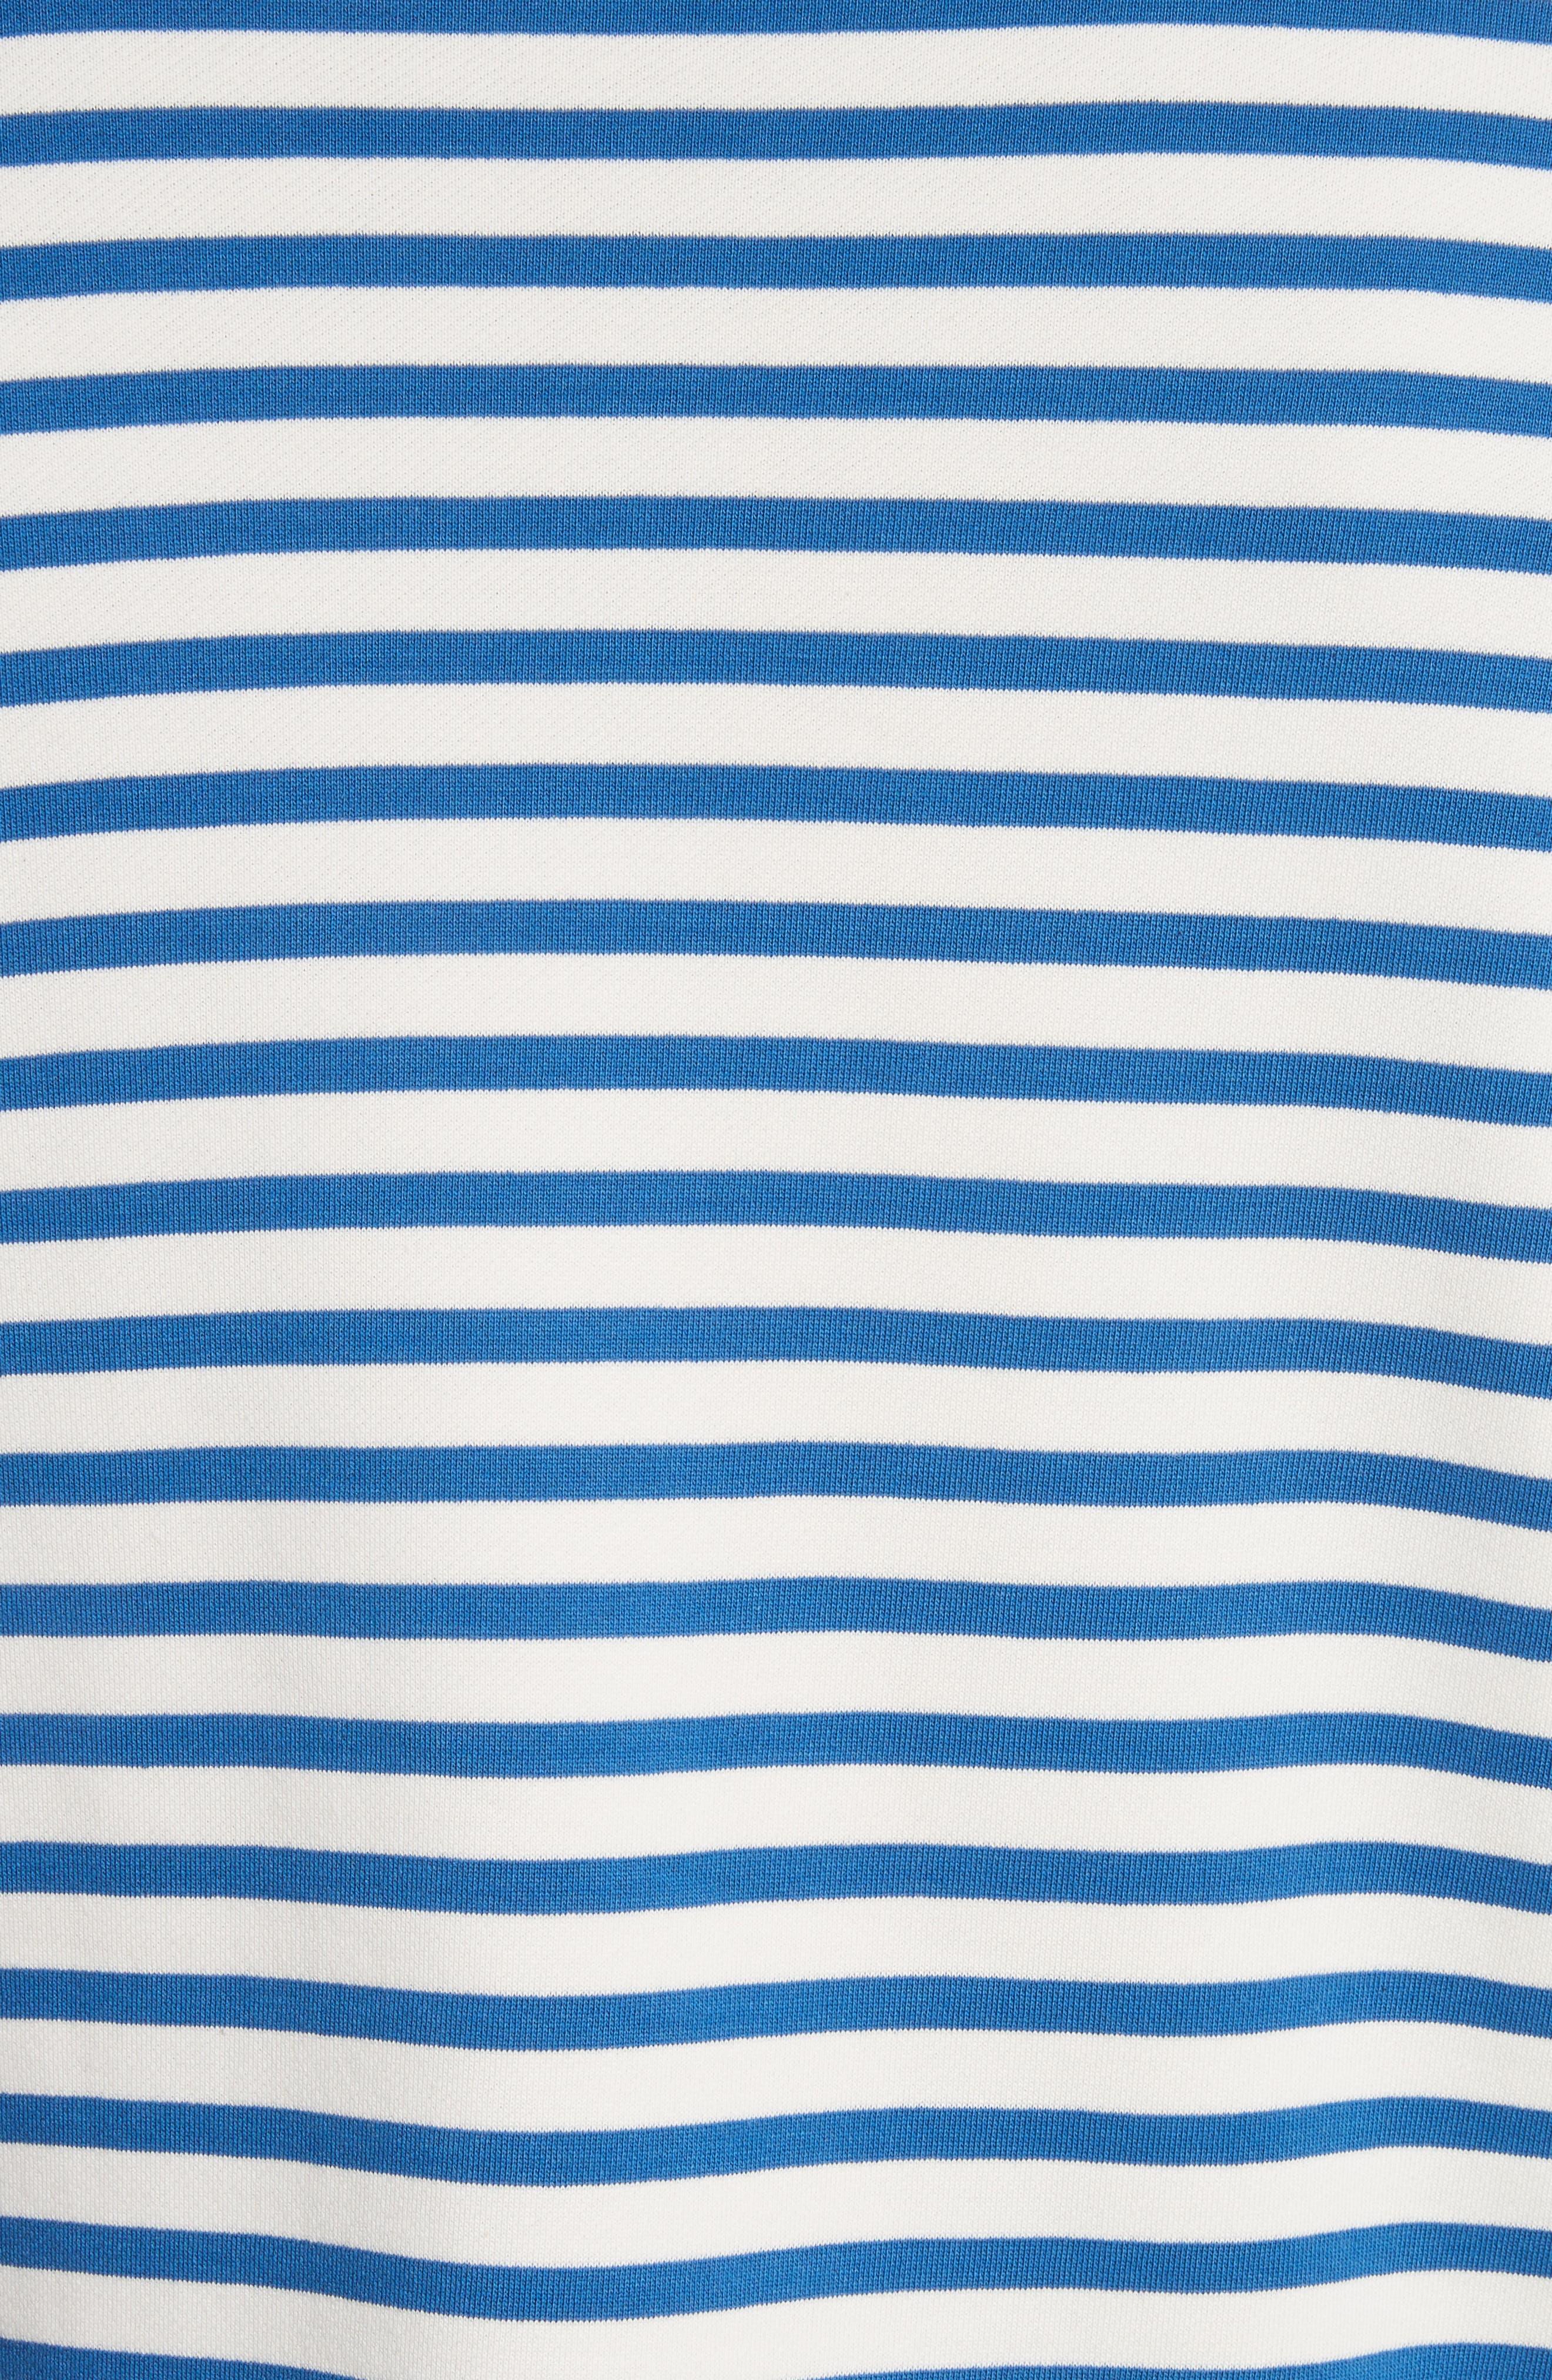 Stripe Crewneck Sweatshirt,                             Alternate thumbnail 5, color,                             Indigo